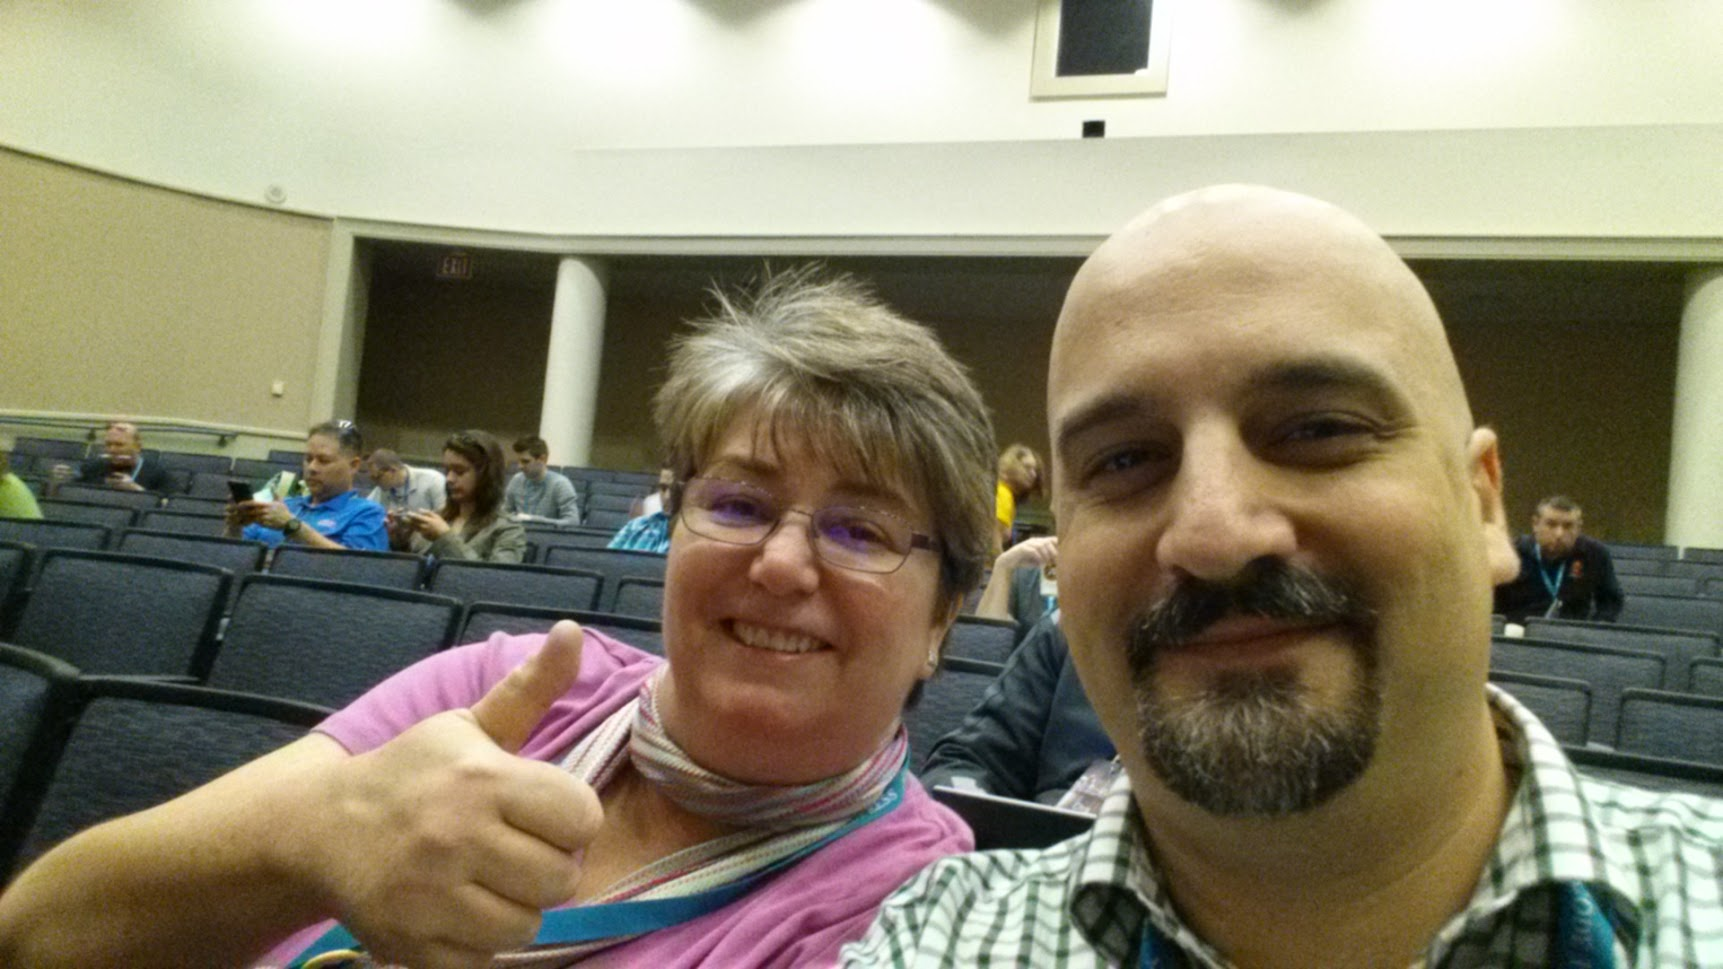 Pam Blizzard, a valuable member of the Sarasota WordPress community